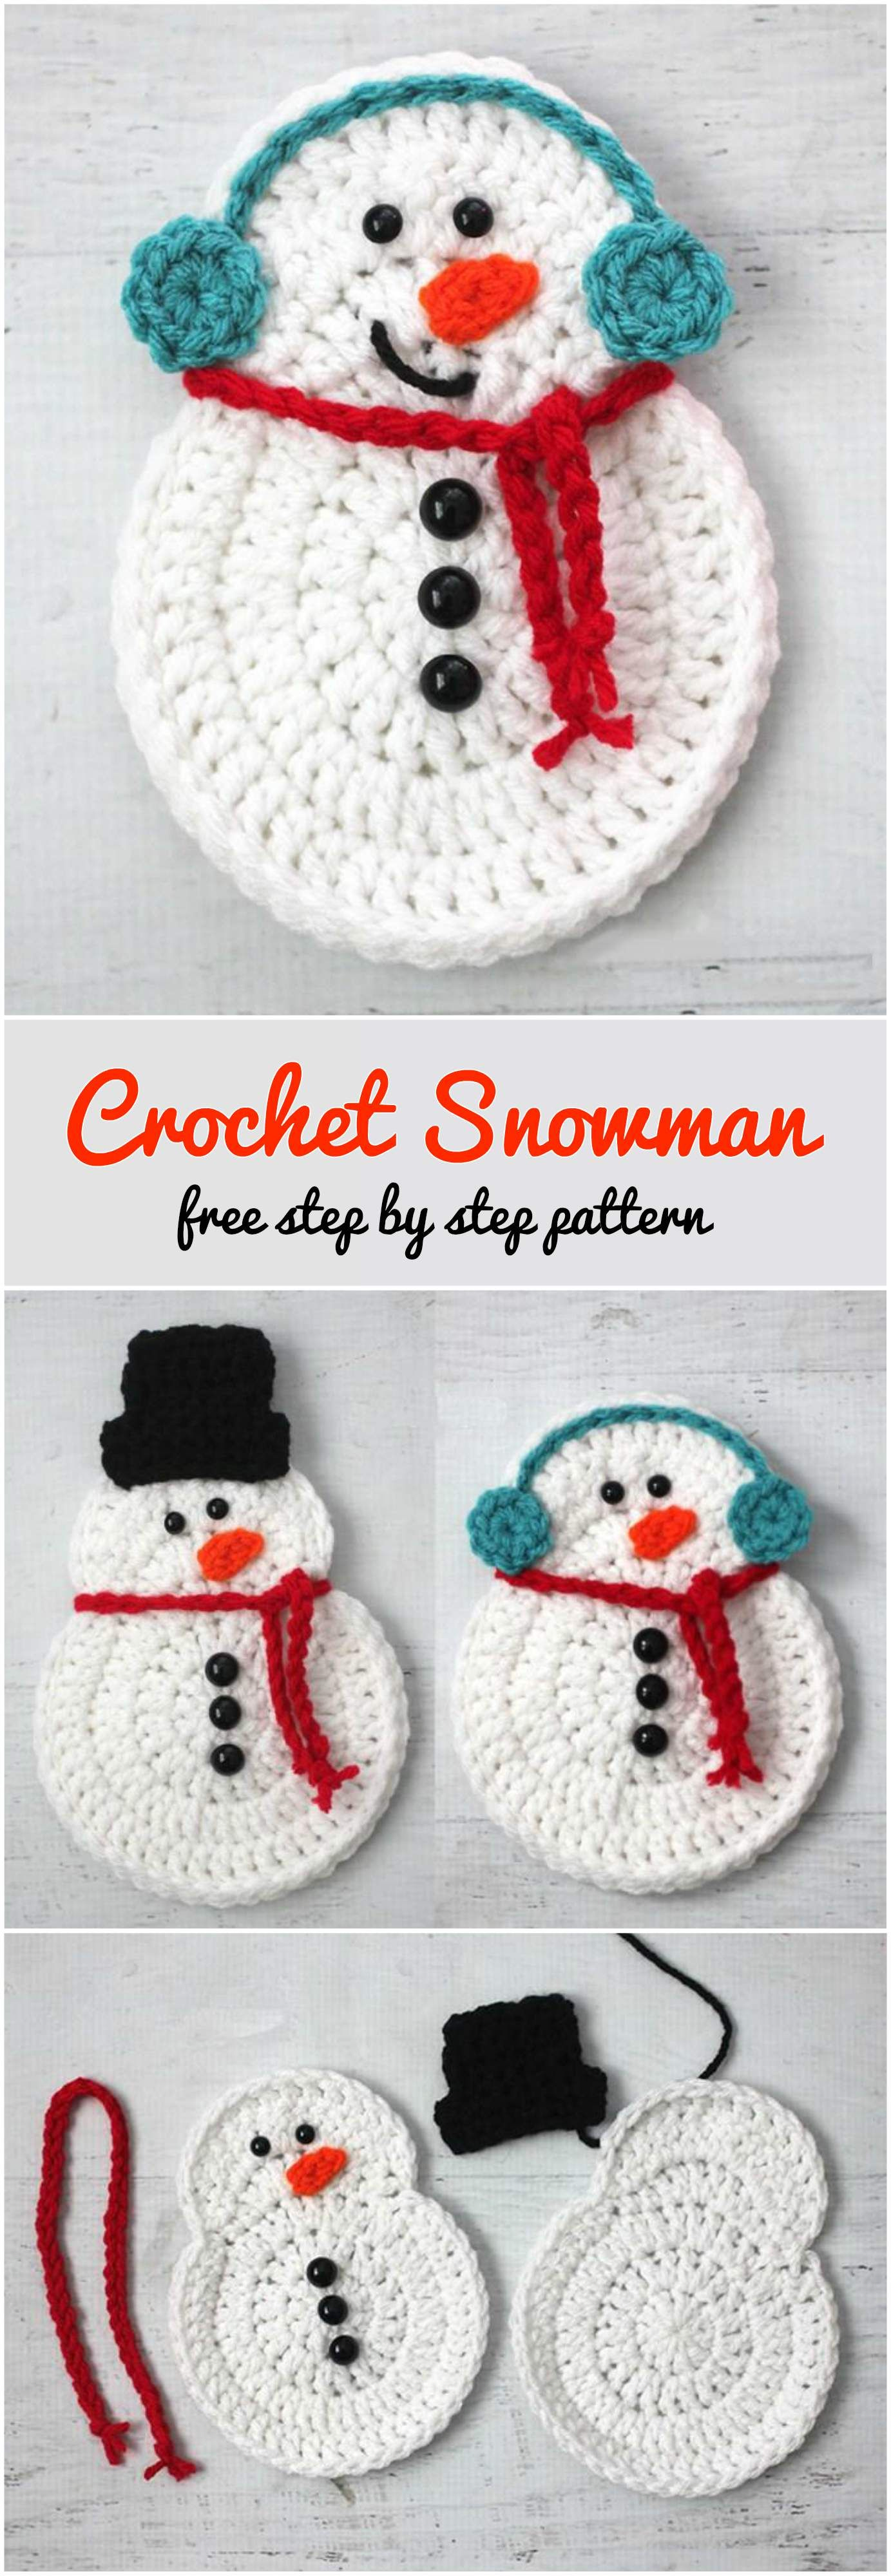 Crochet Snowman Step by Step | Tejidos | Pinterest | Navidad, Tejido ...